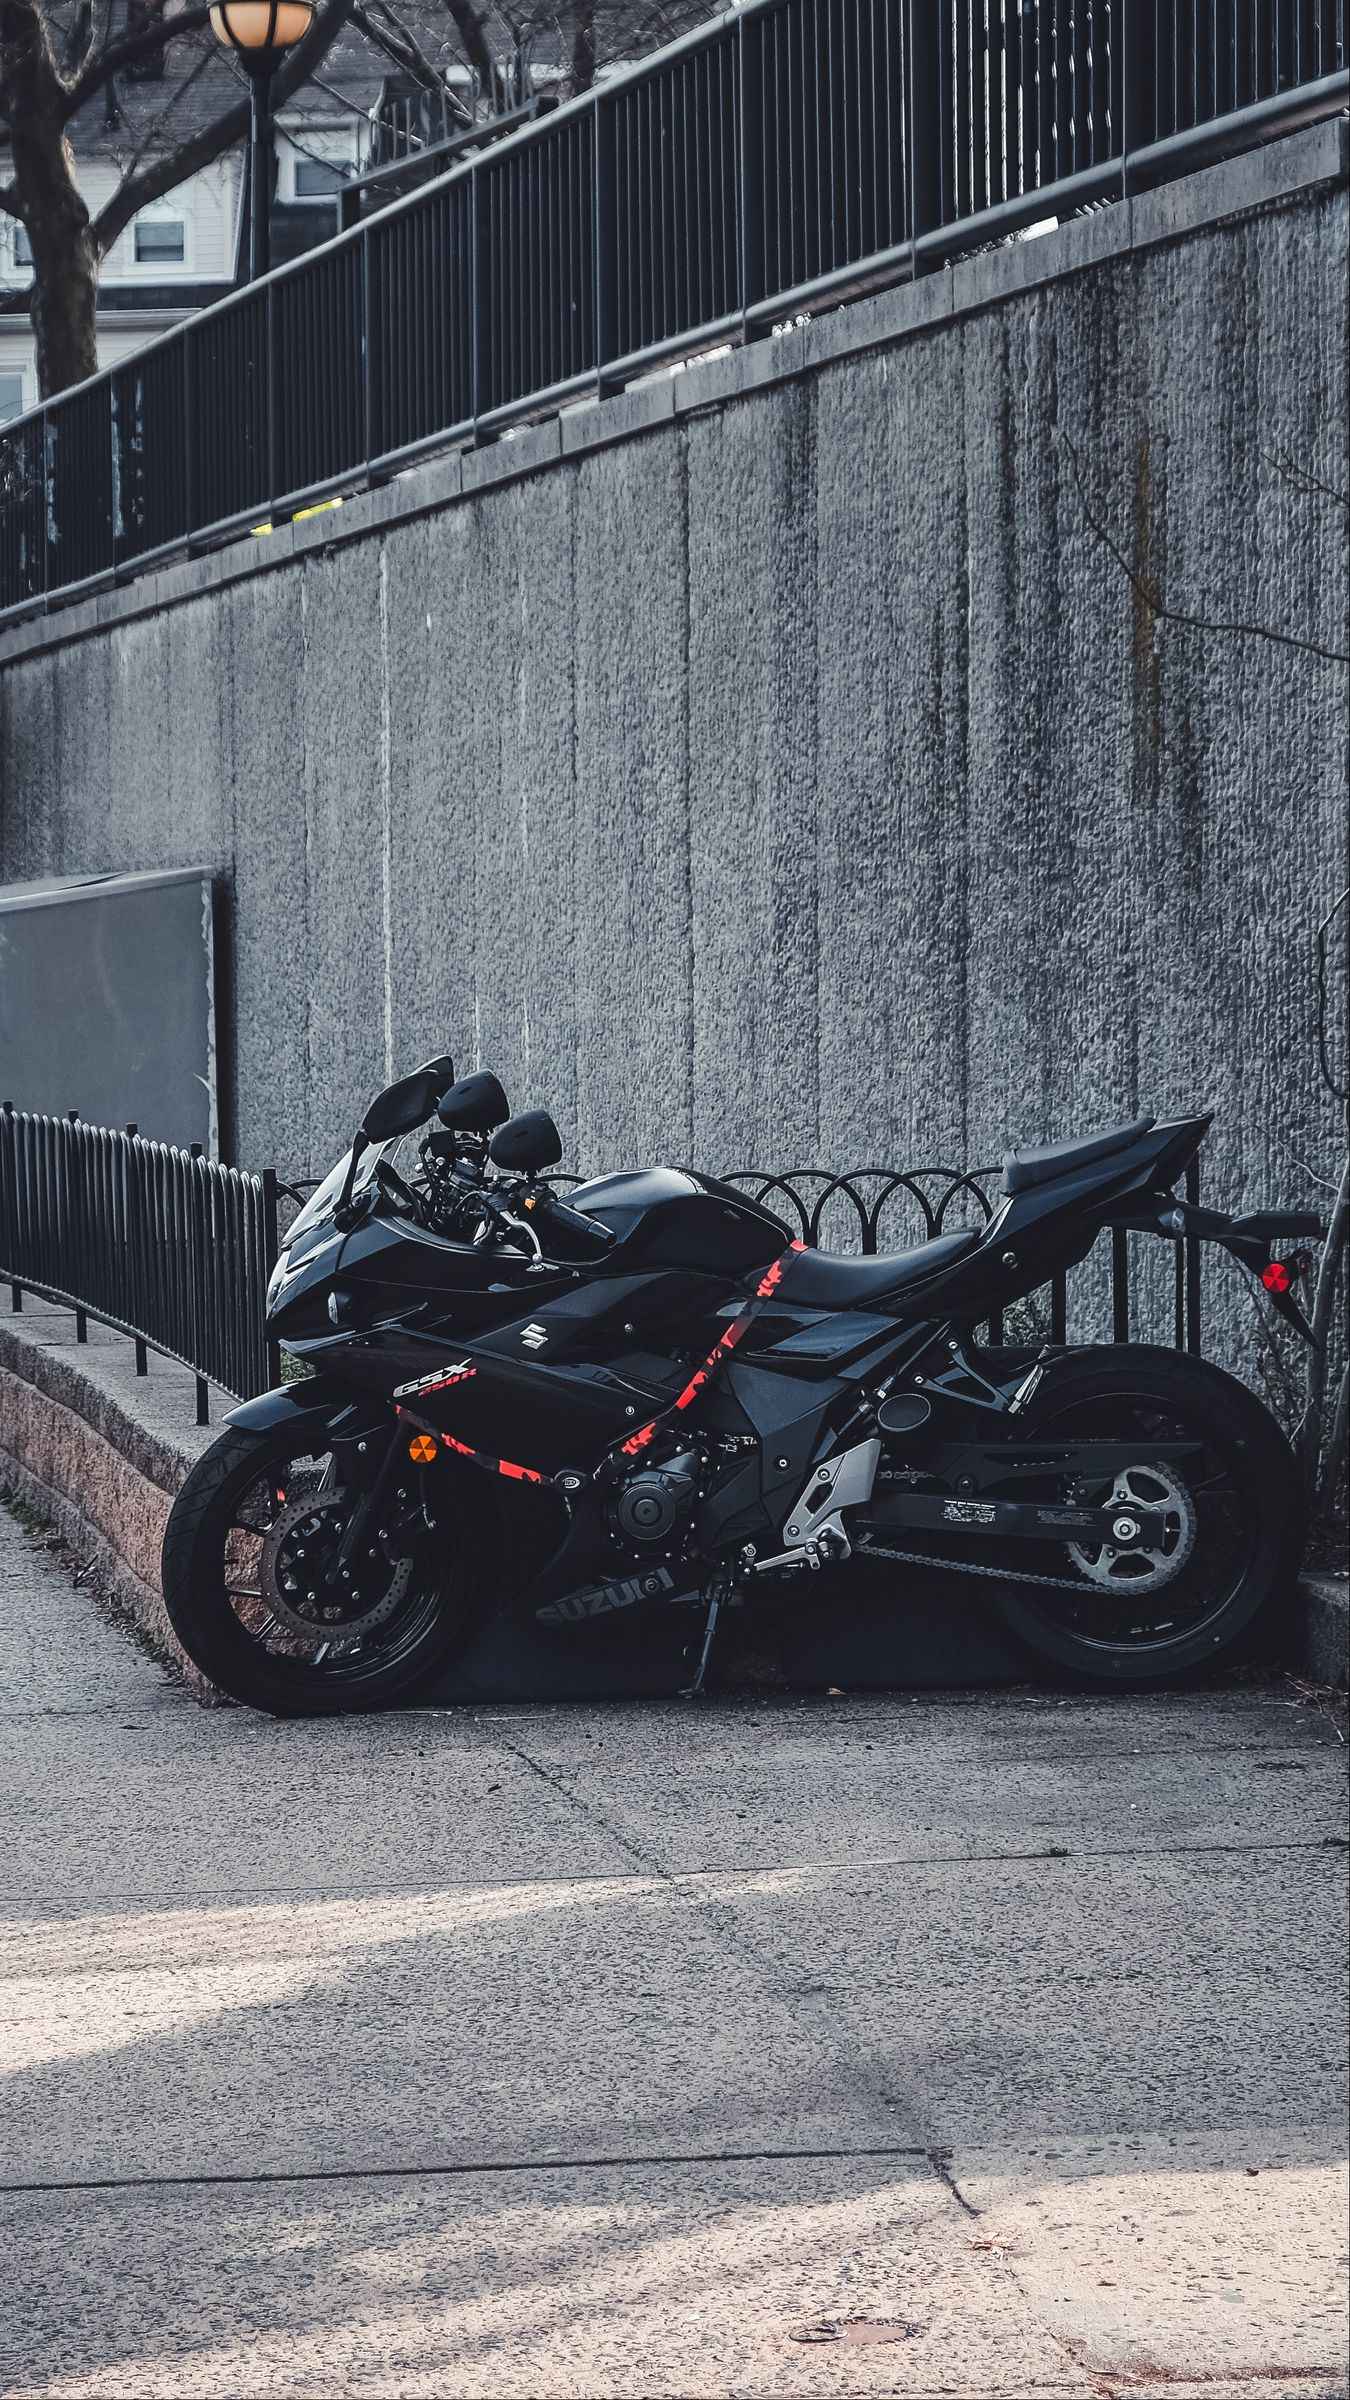 1350x2400 Wallpaper suzuki, motorcycle, bike, black, parking